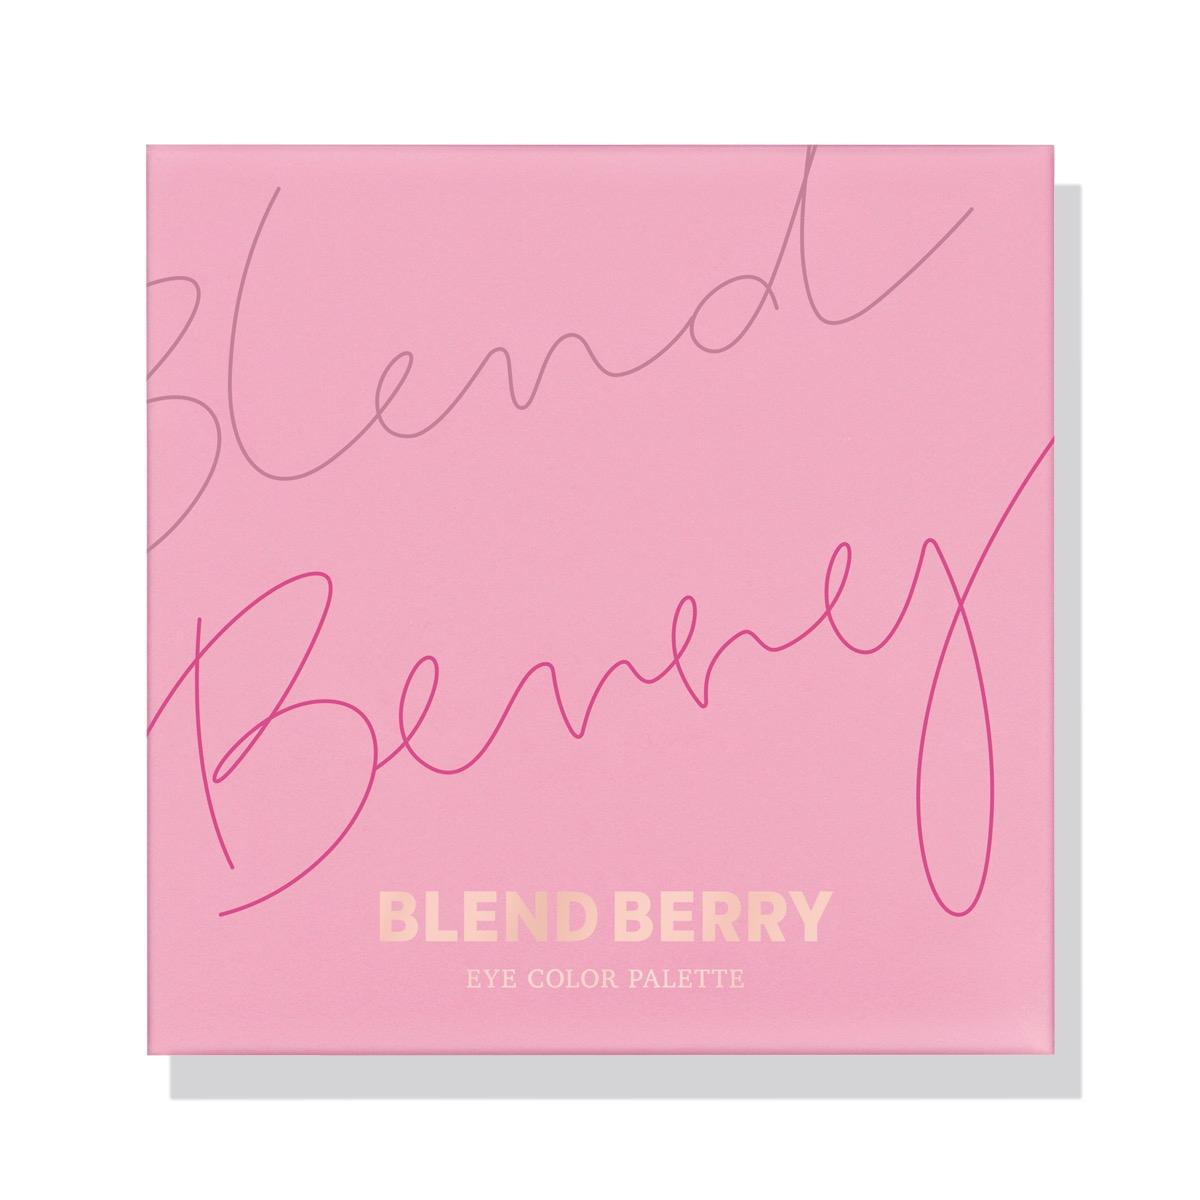 BLEND BERRY(ブレンドベリー)オーラクリエイション